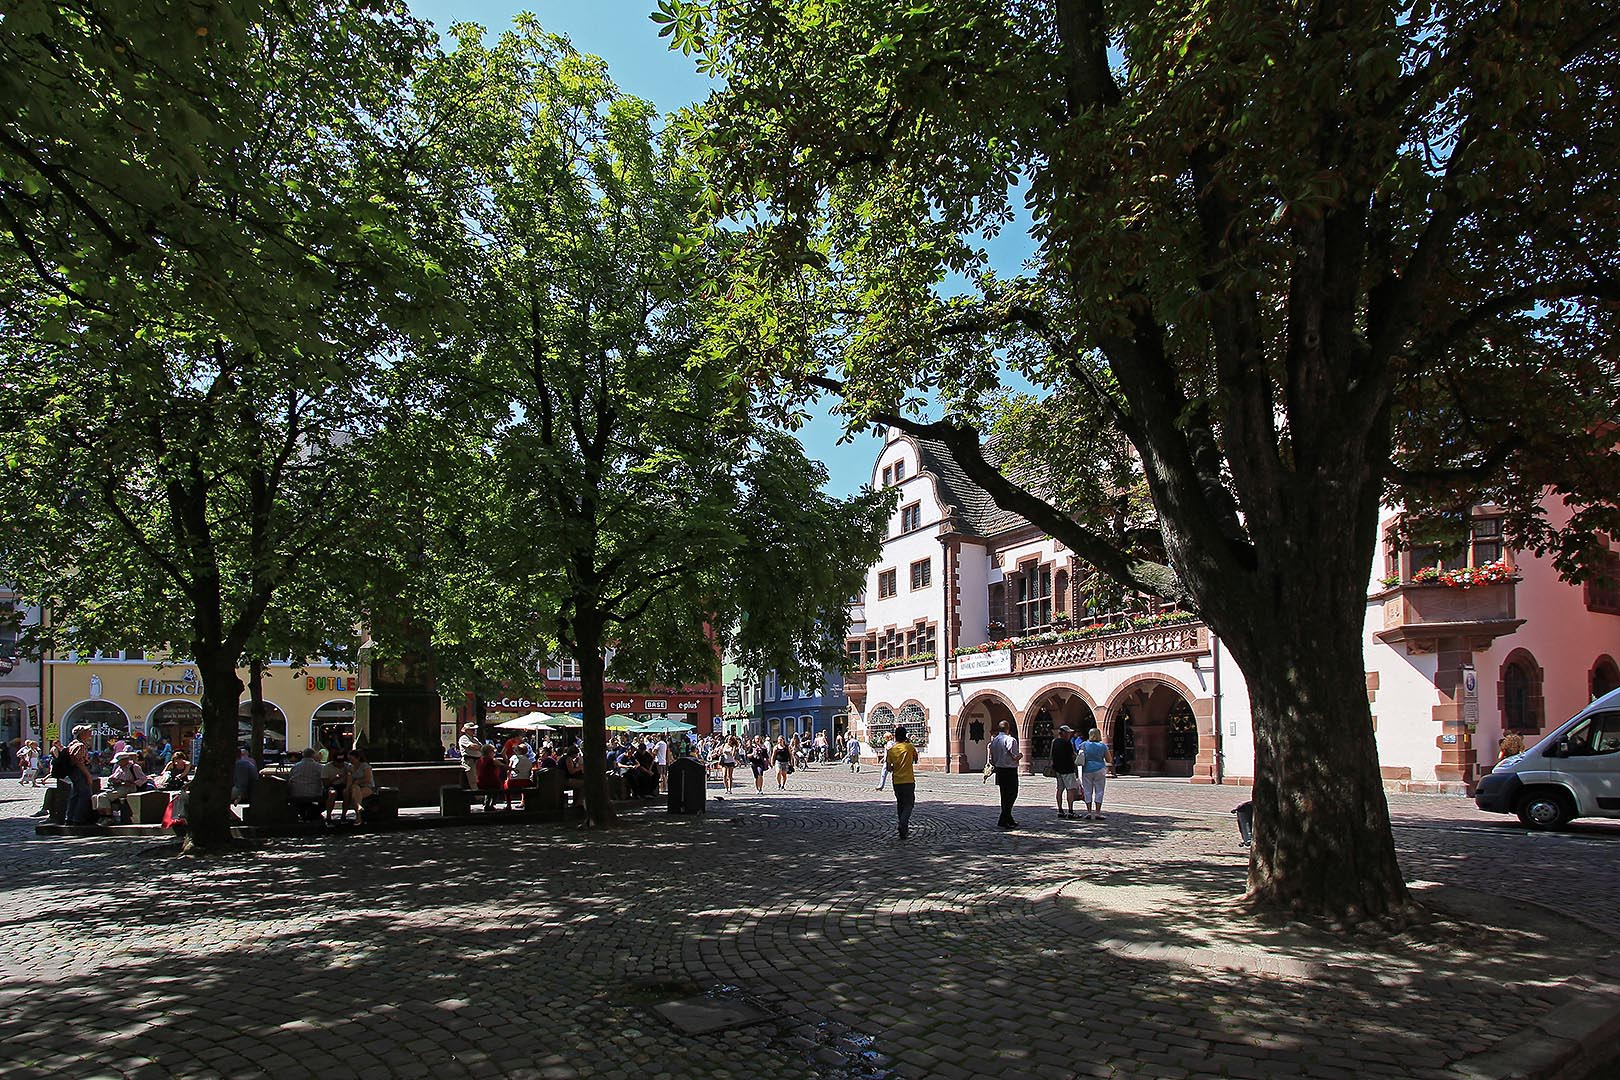 Freiburg - Piscine foret noire le havre ...